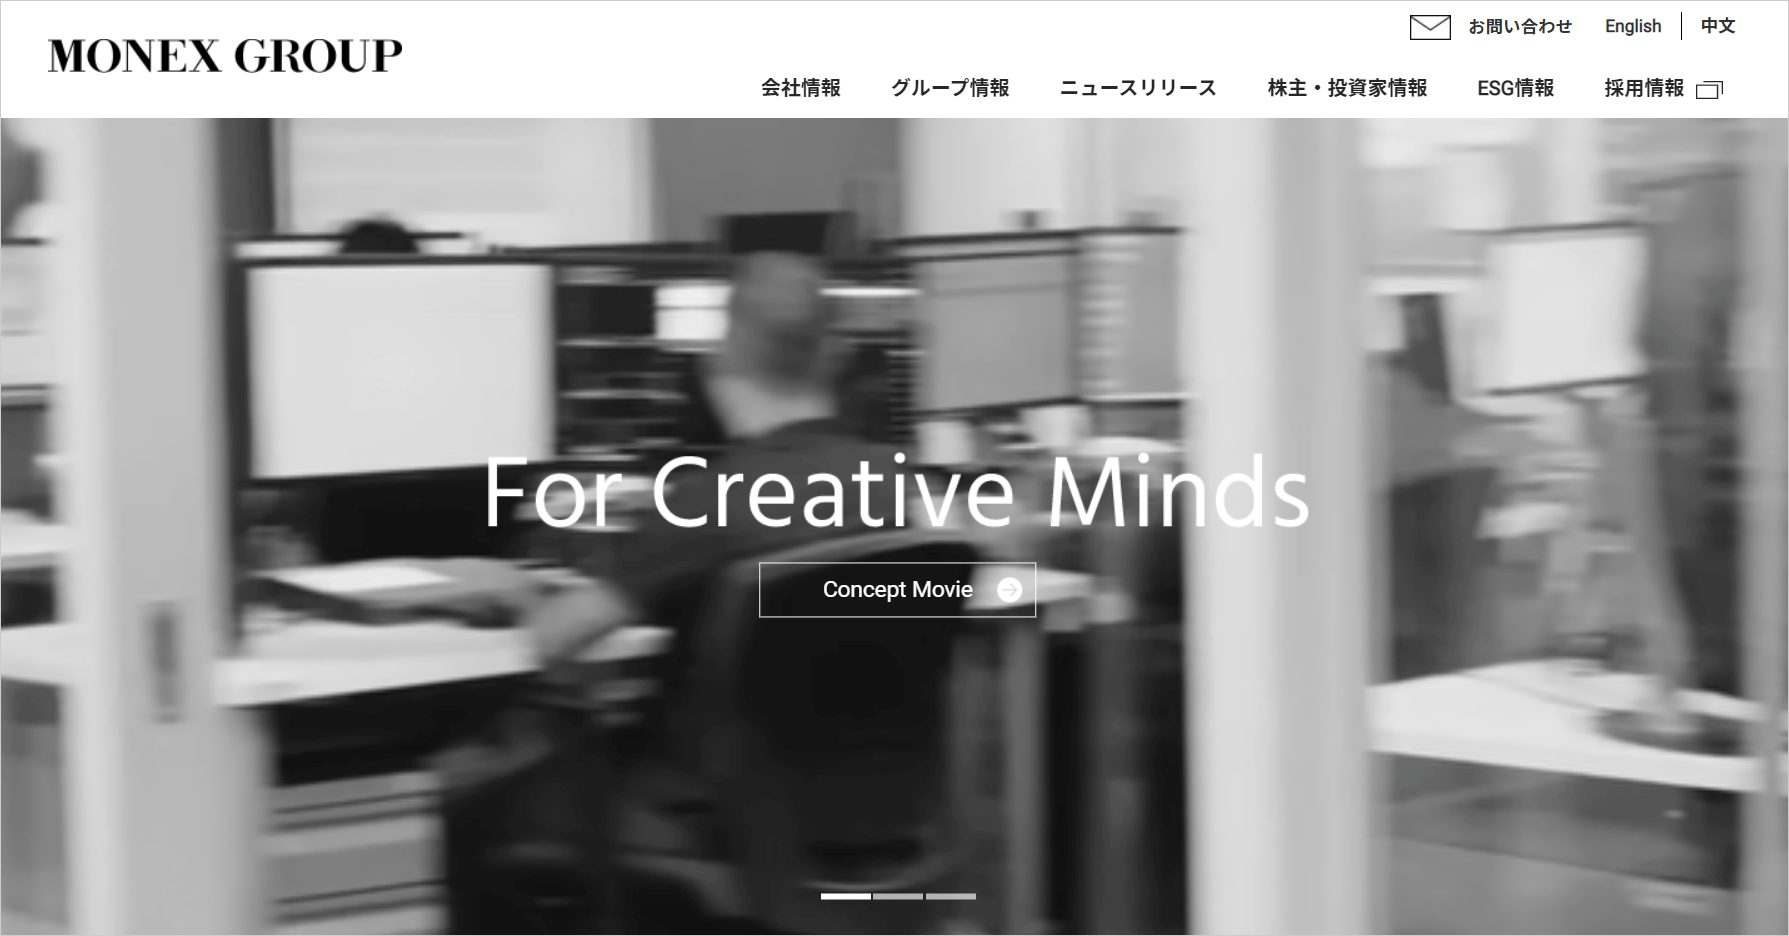 CMSを導入したマネックスグループ株式会社のホームページ